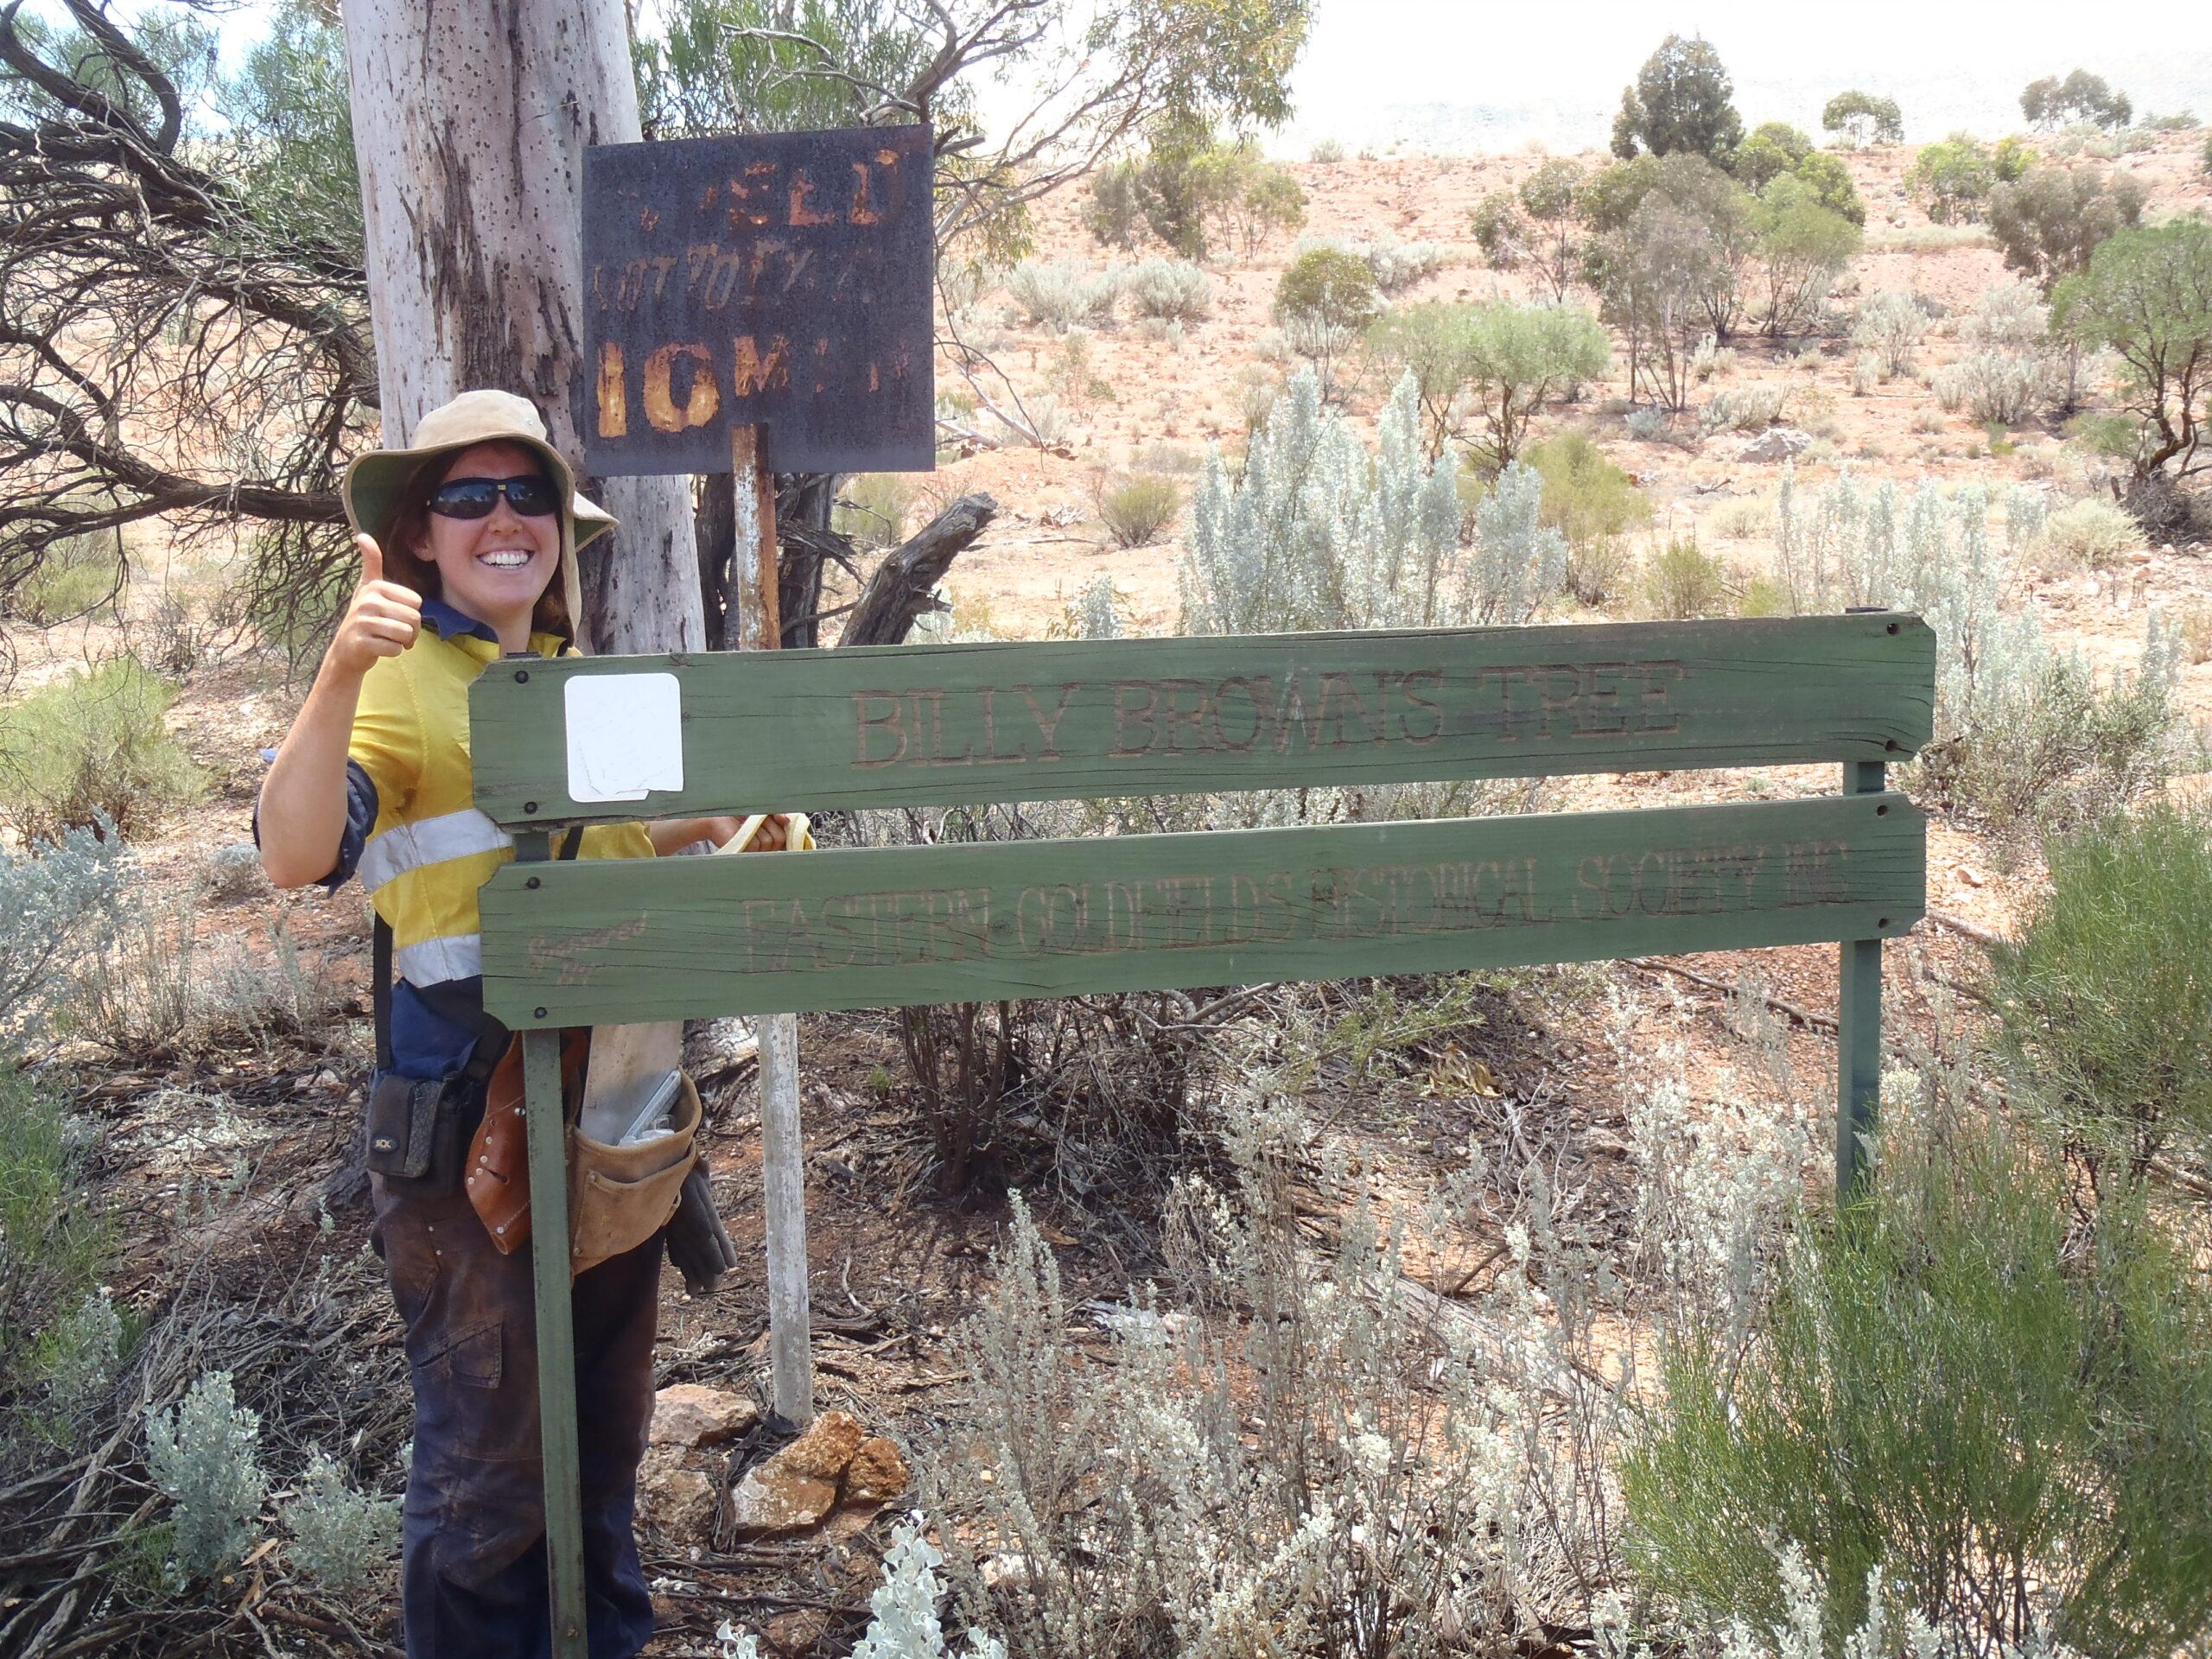 Celine Mangan, Principal – Mine Closure and Rehabilitation at Mineral Resources